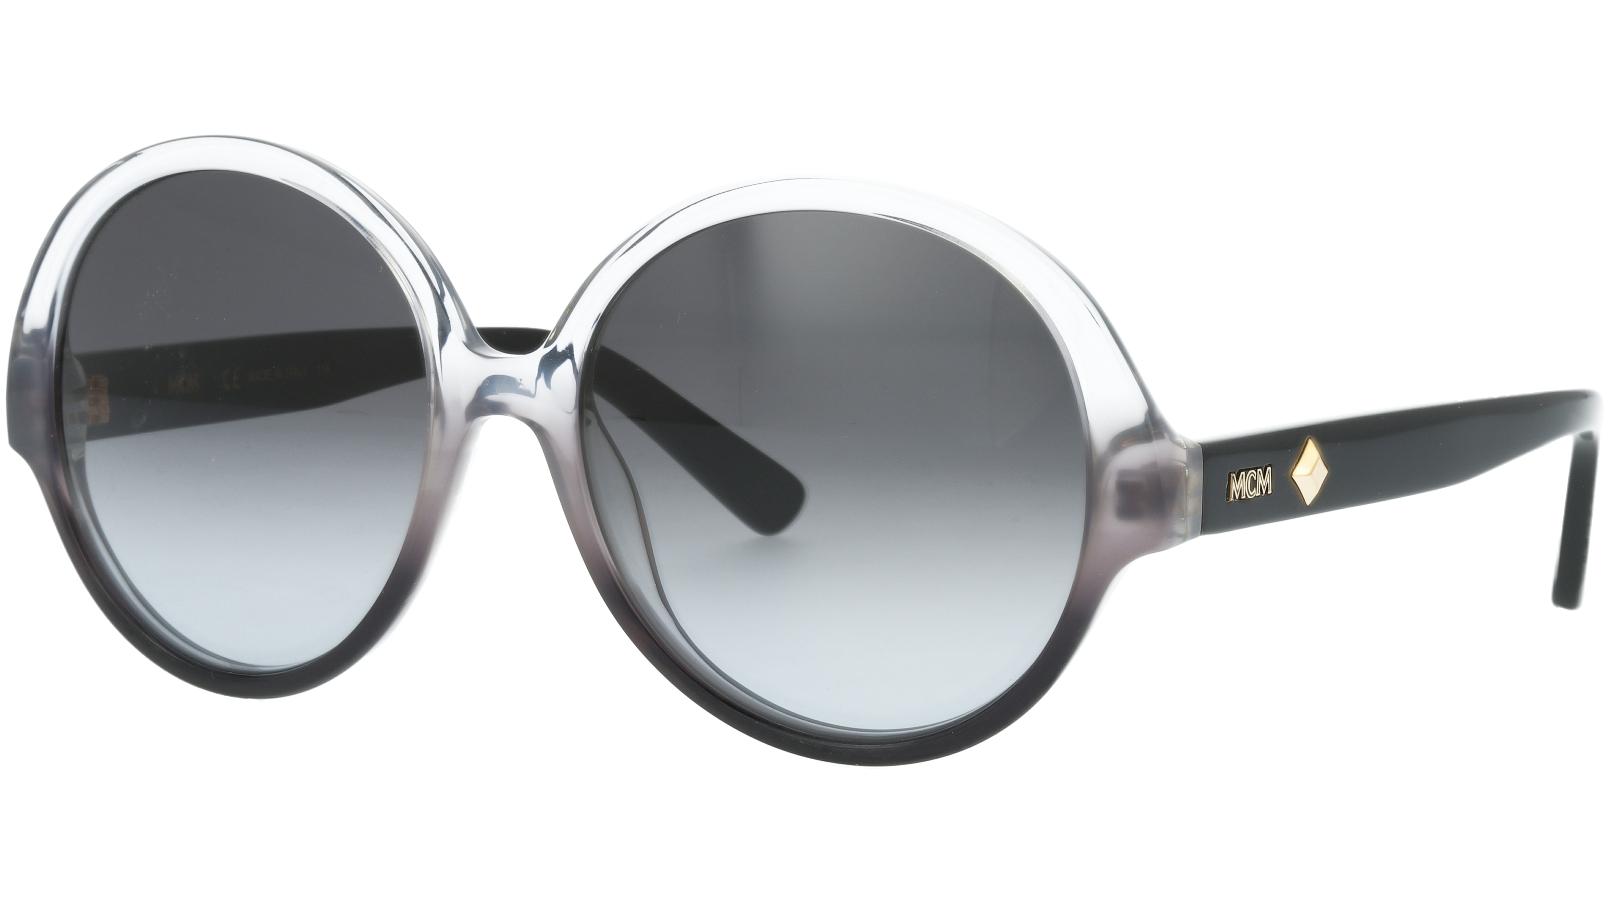 MCM MCM615S 023 58 GREY Sunglasses